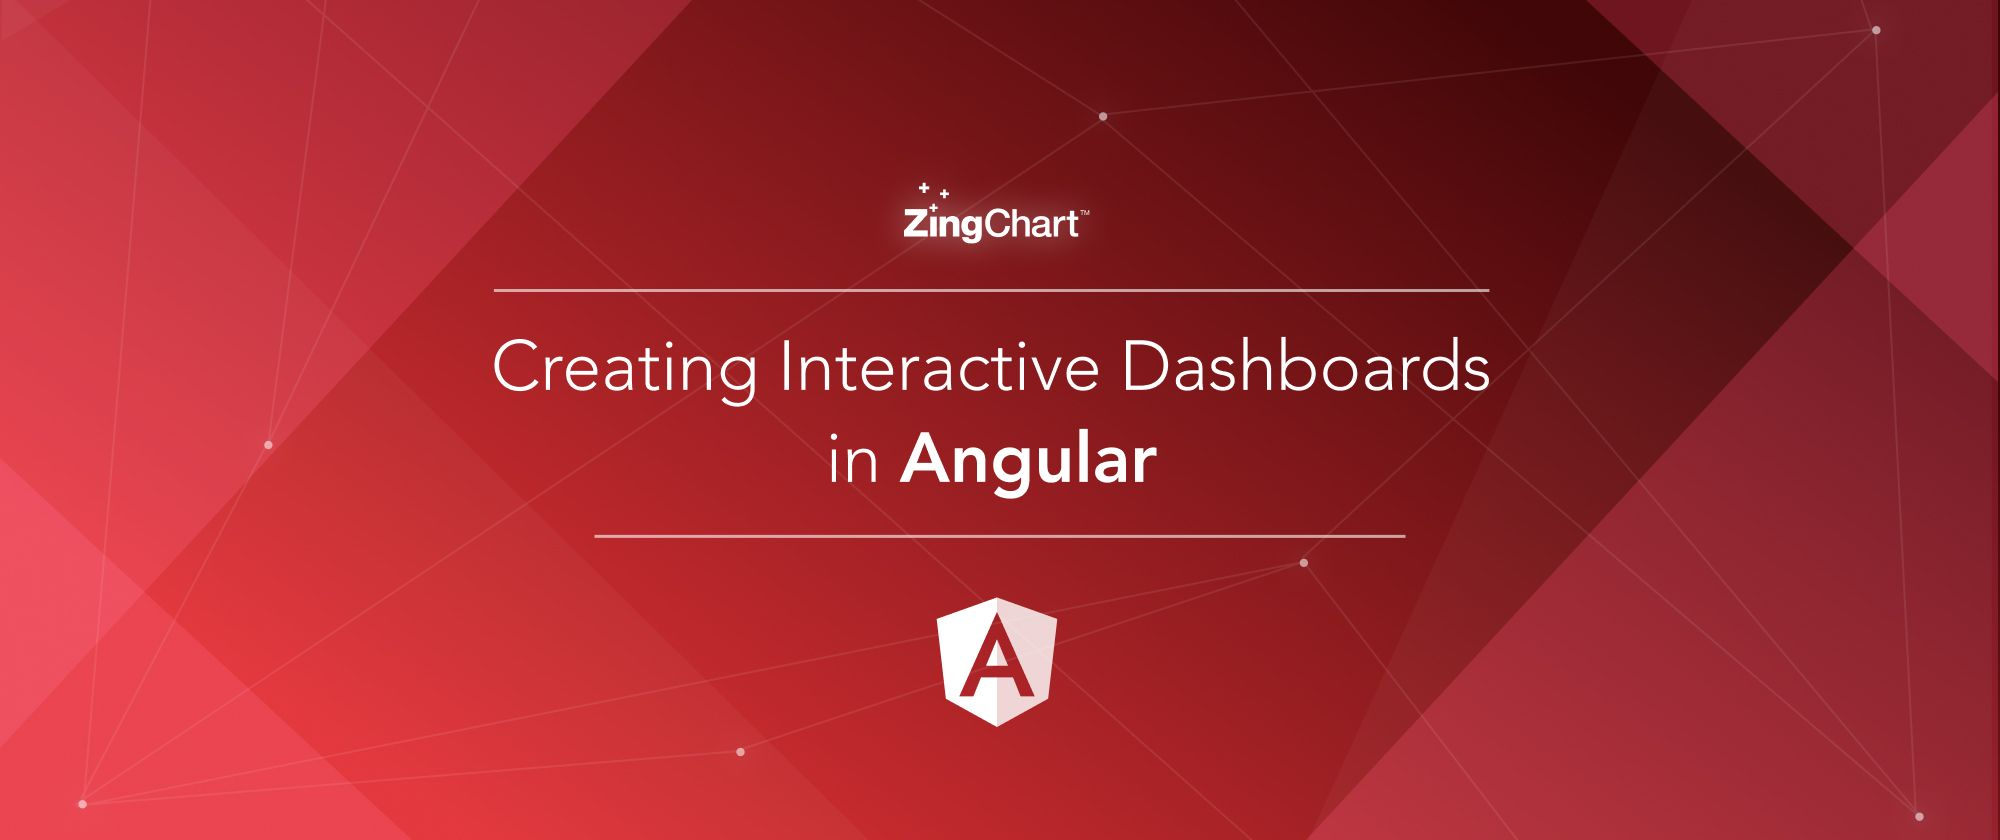 Creating Interactive Dashboards in Angular